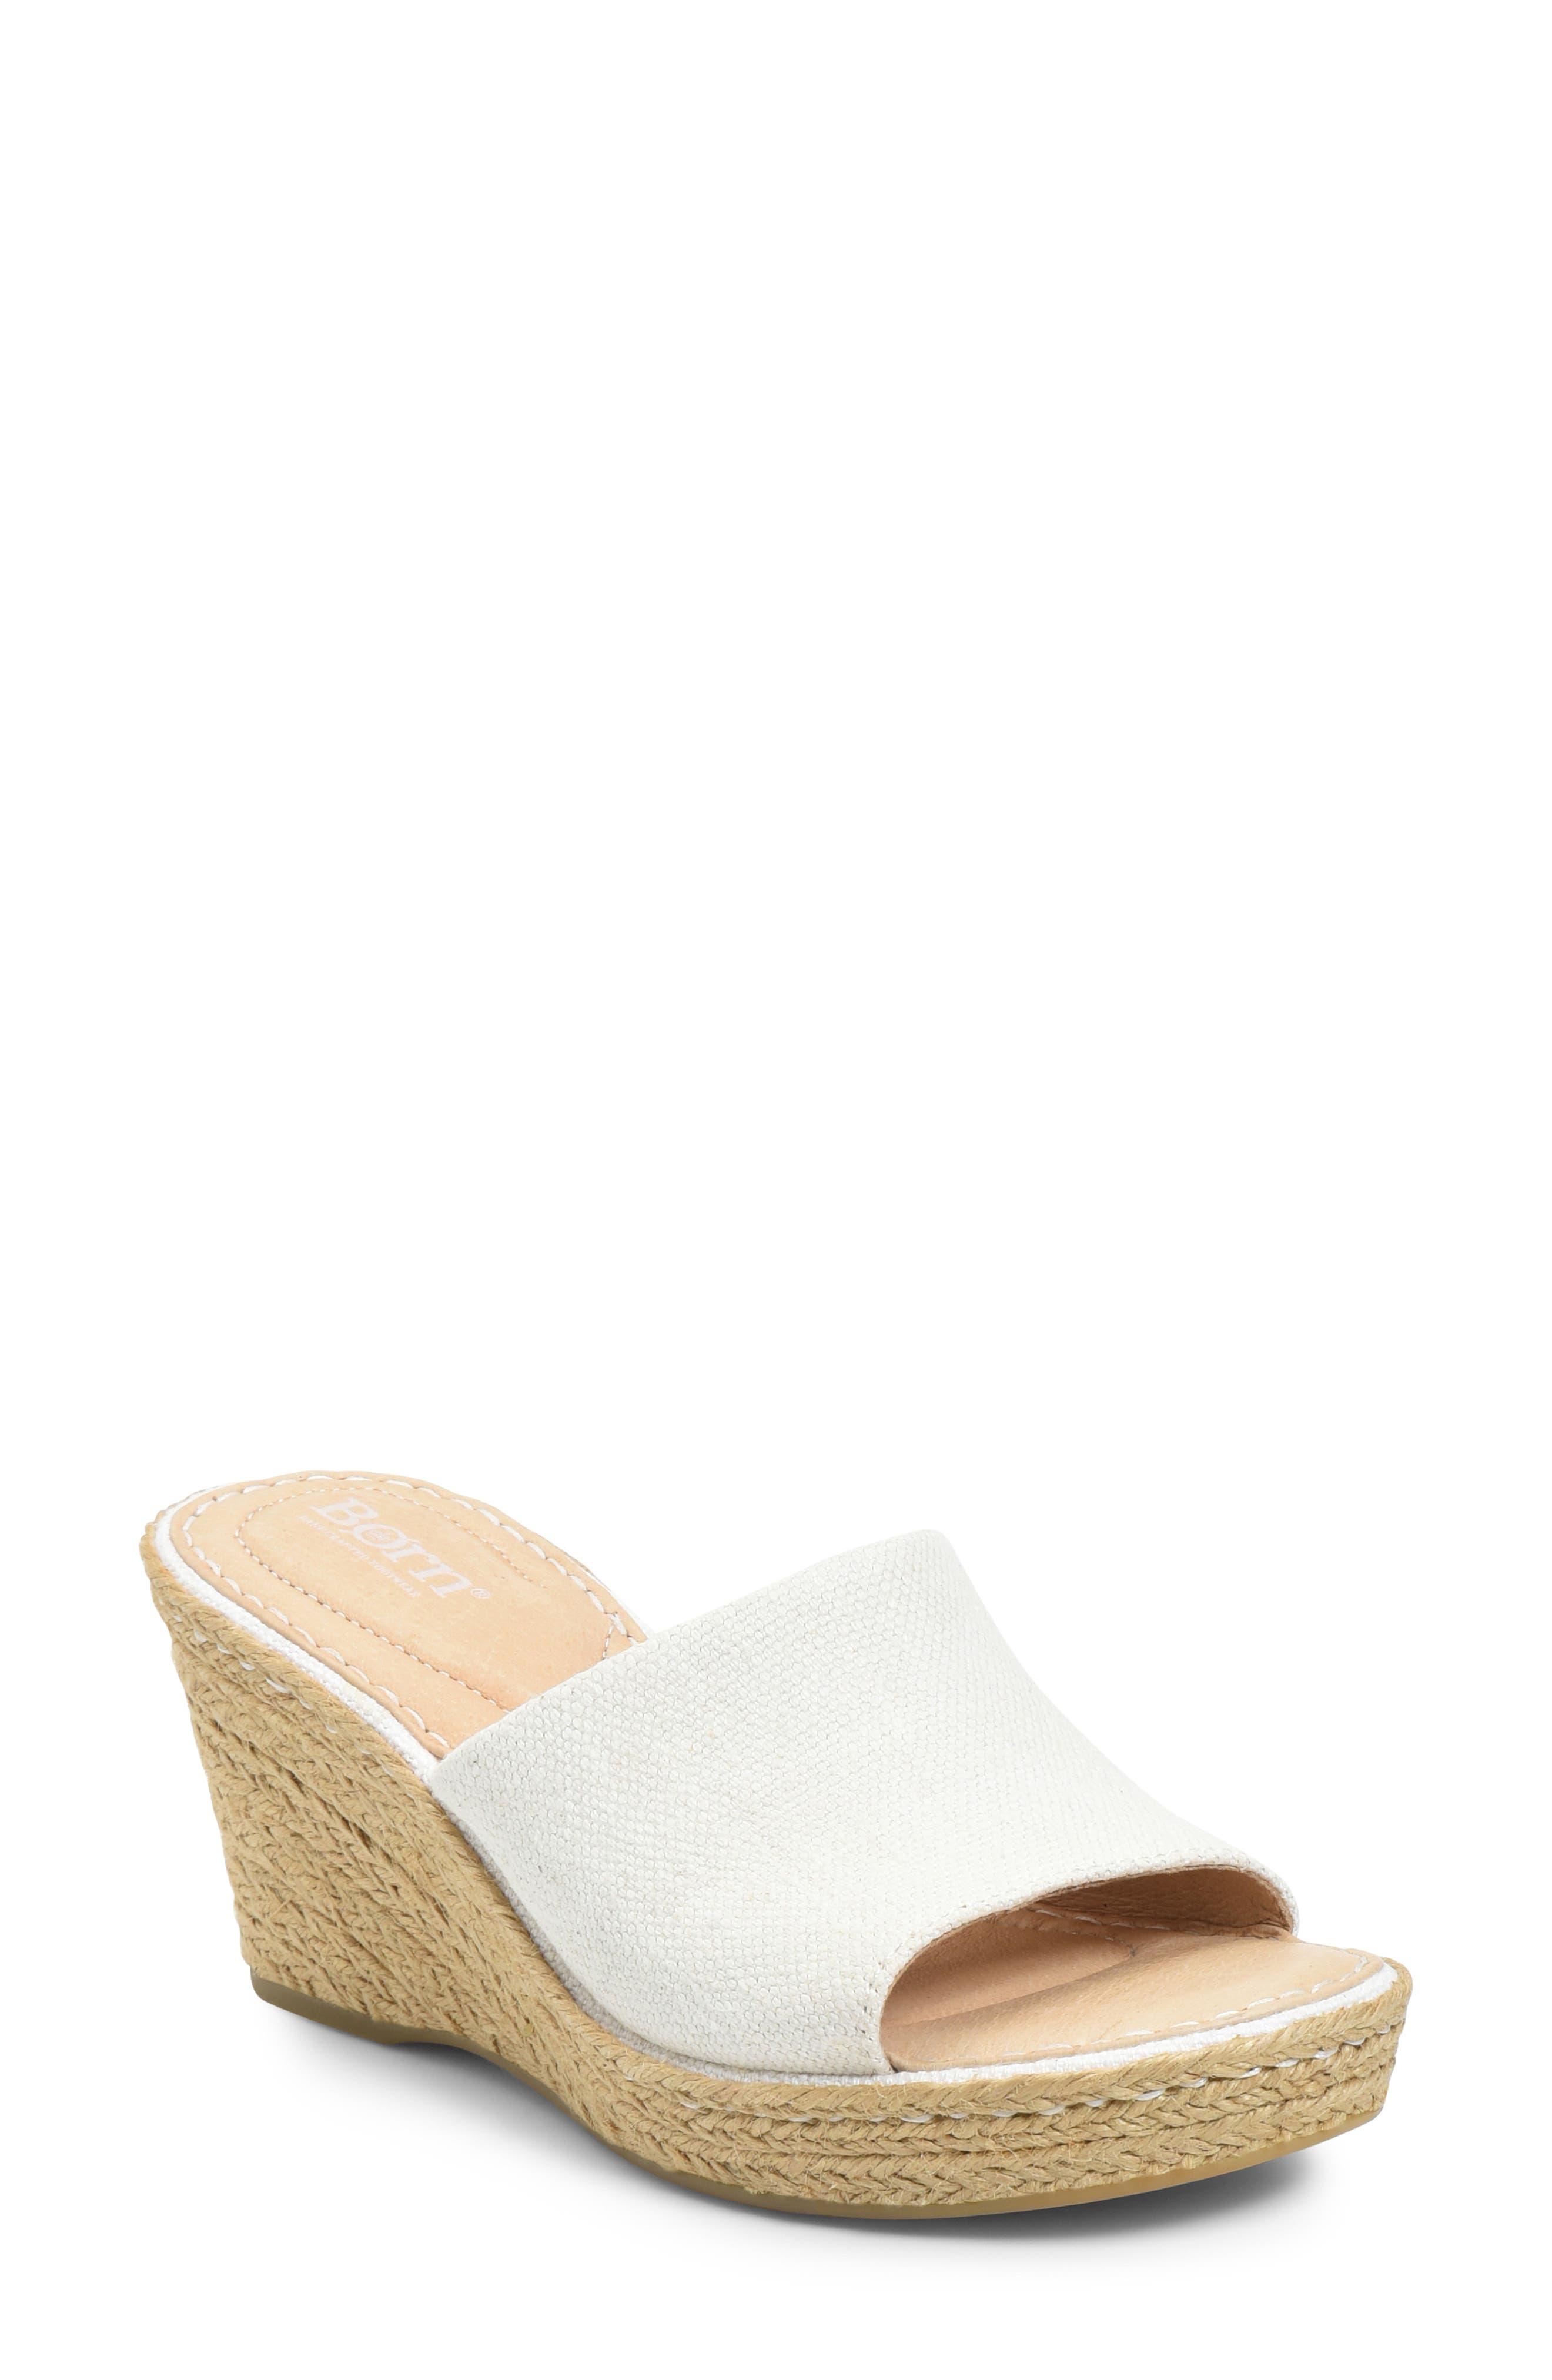 B?rn Missoula Wedge Sandal